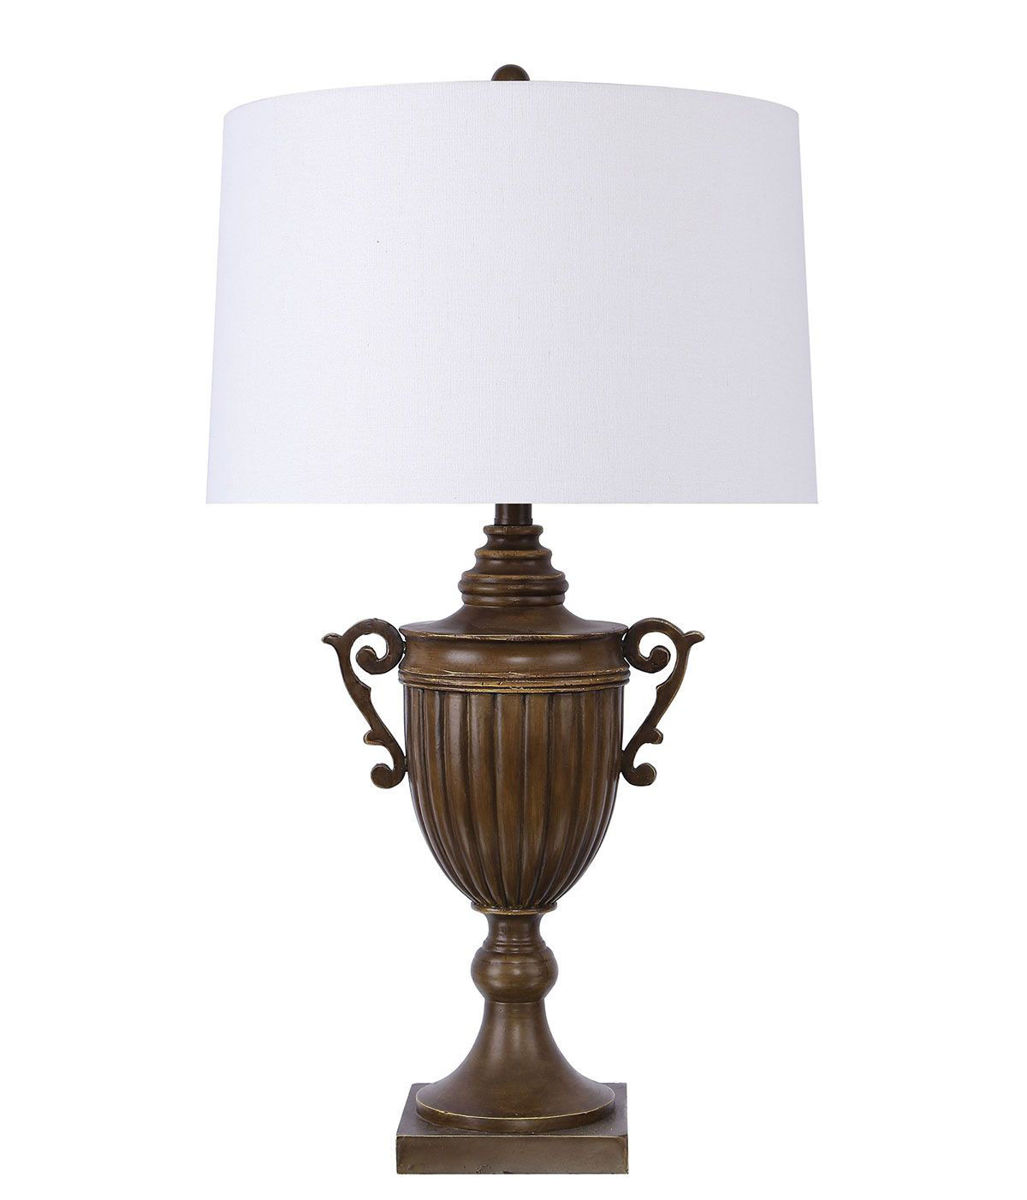 Picture of DONATELLA TABLE LAMP PAIR